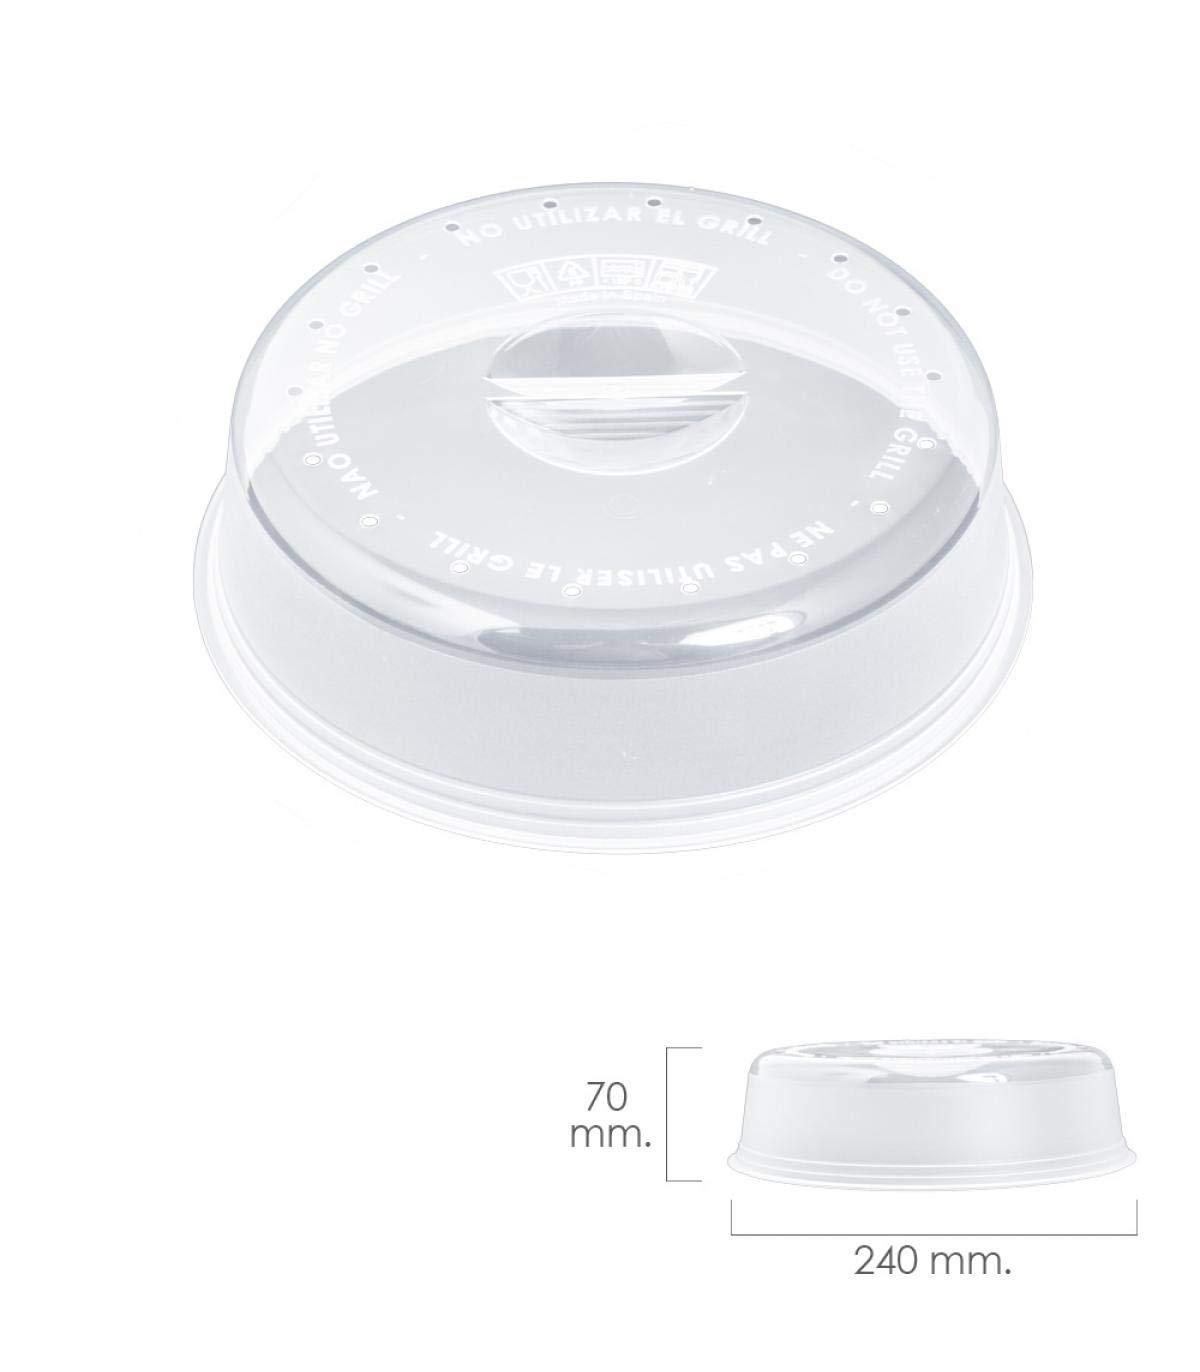 ORYX 5071015 Tapa Microondas Ø 24 x 7 cm, Transparente